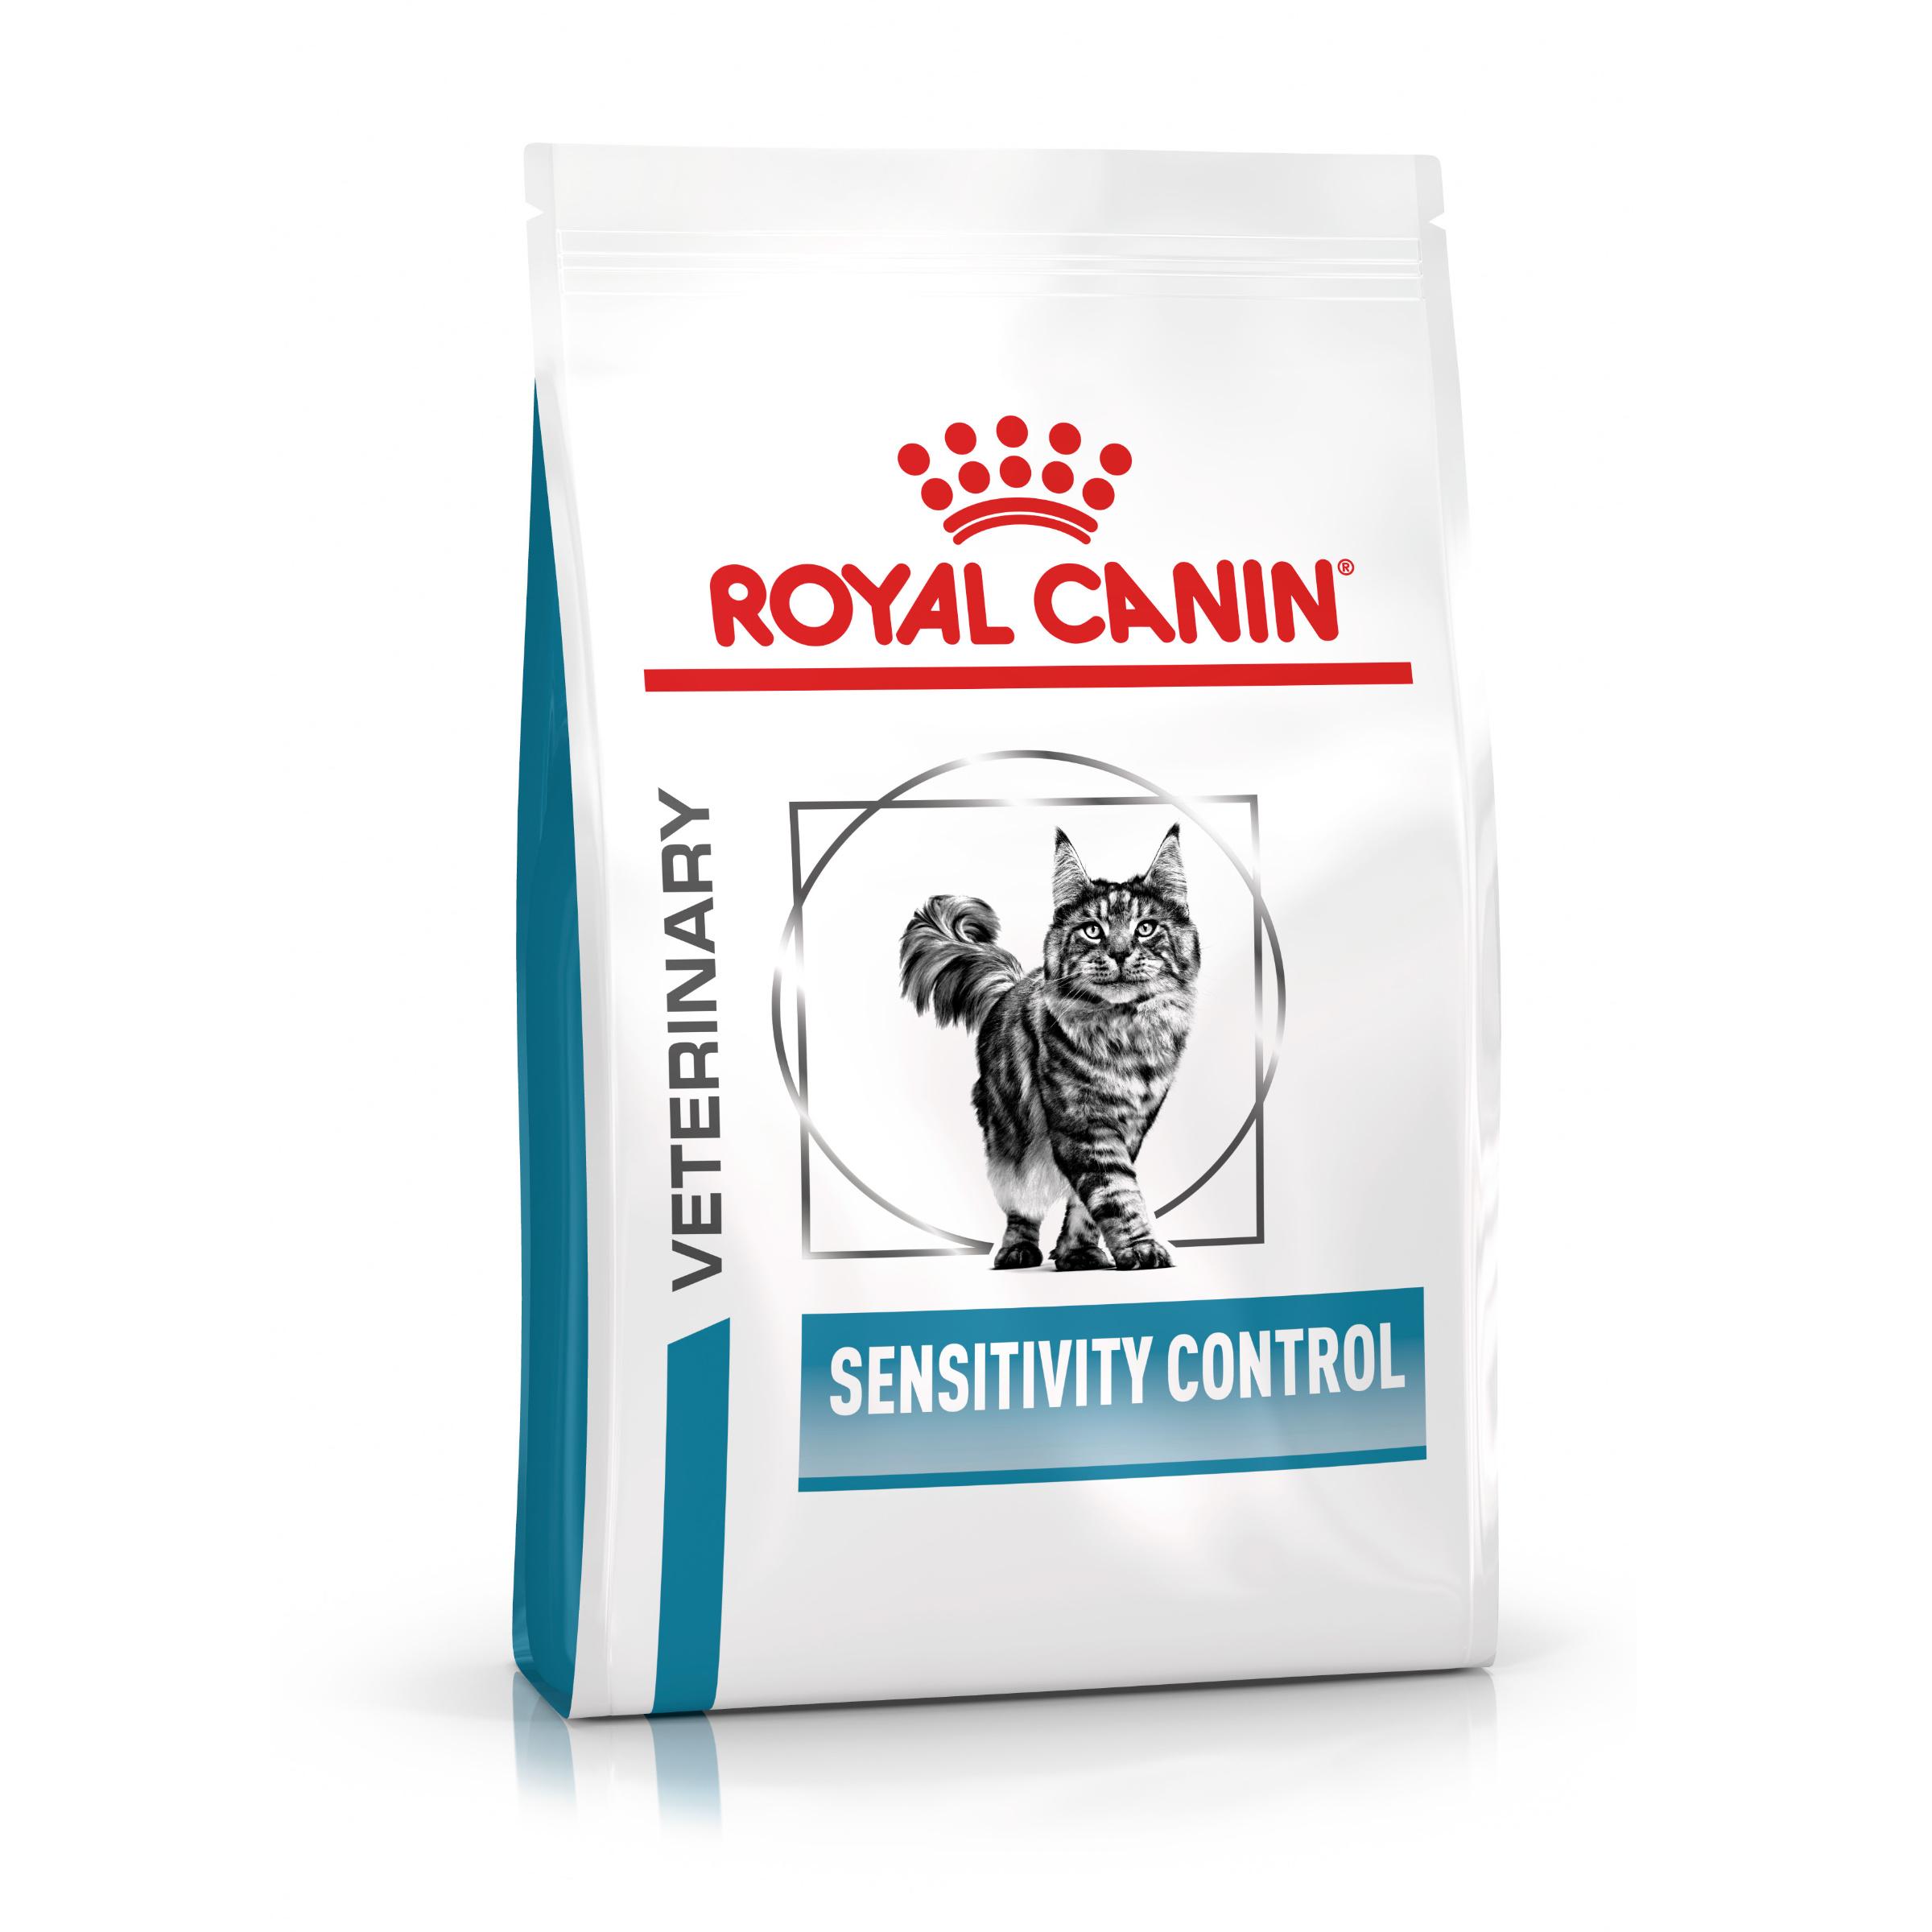 Royal canin veterinary health nutrition cat sensitivity control 400g